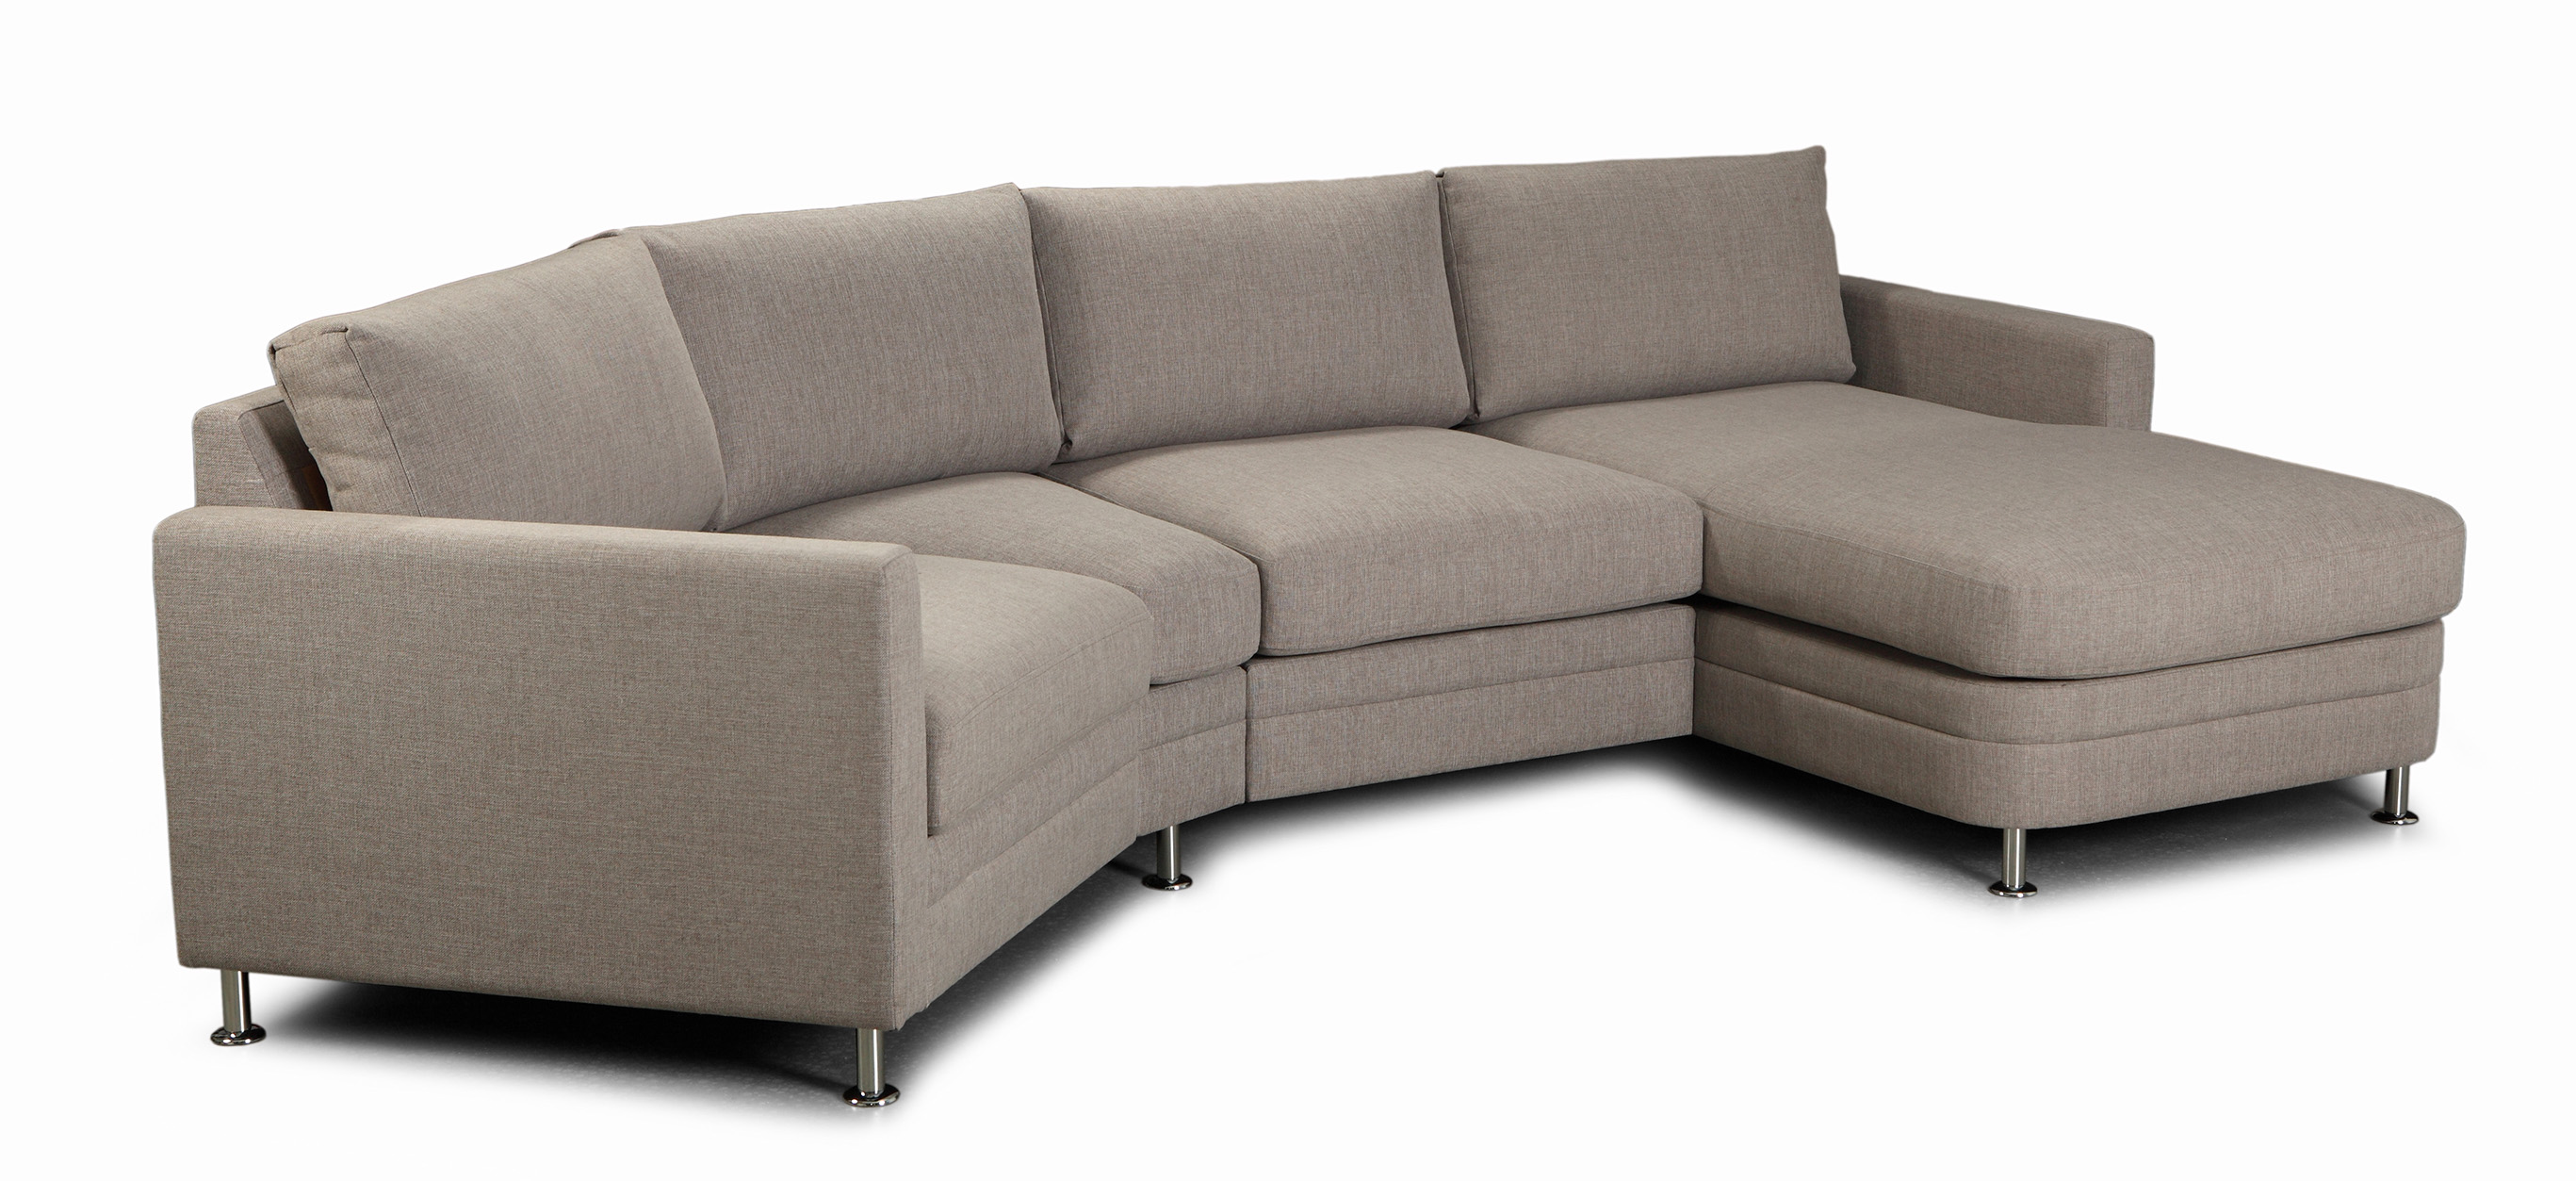 Modern living soffa - Divansoffa med modulböj